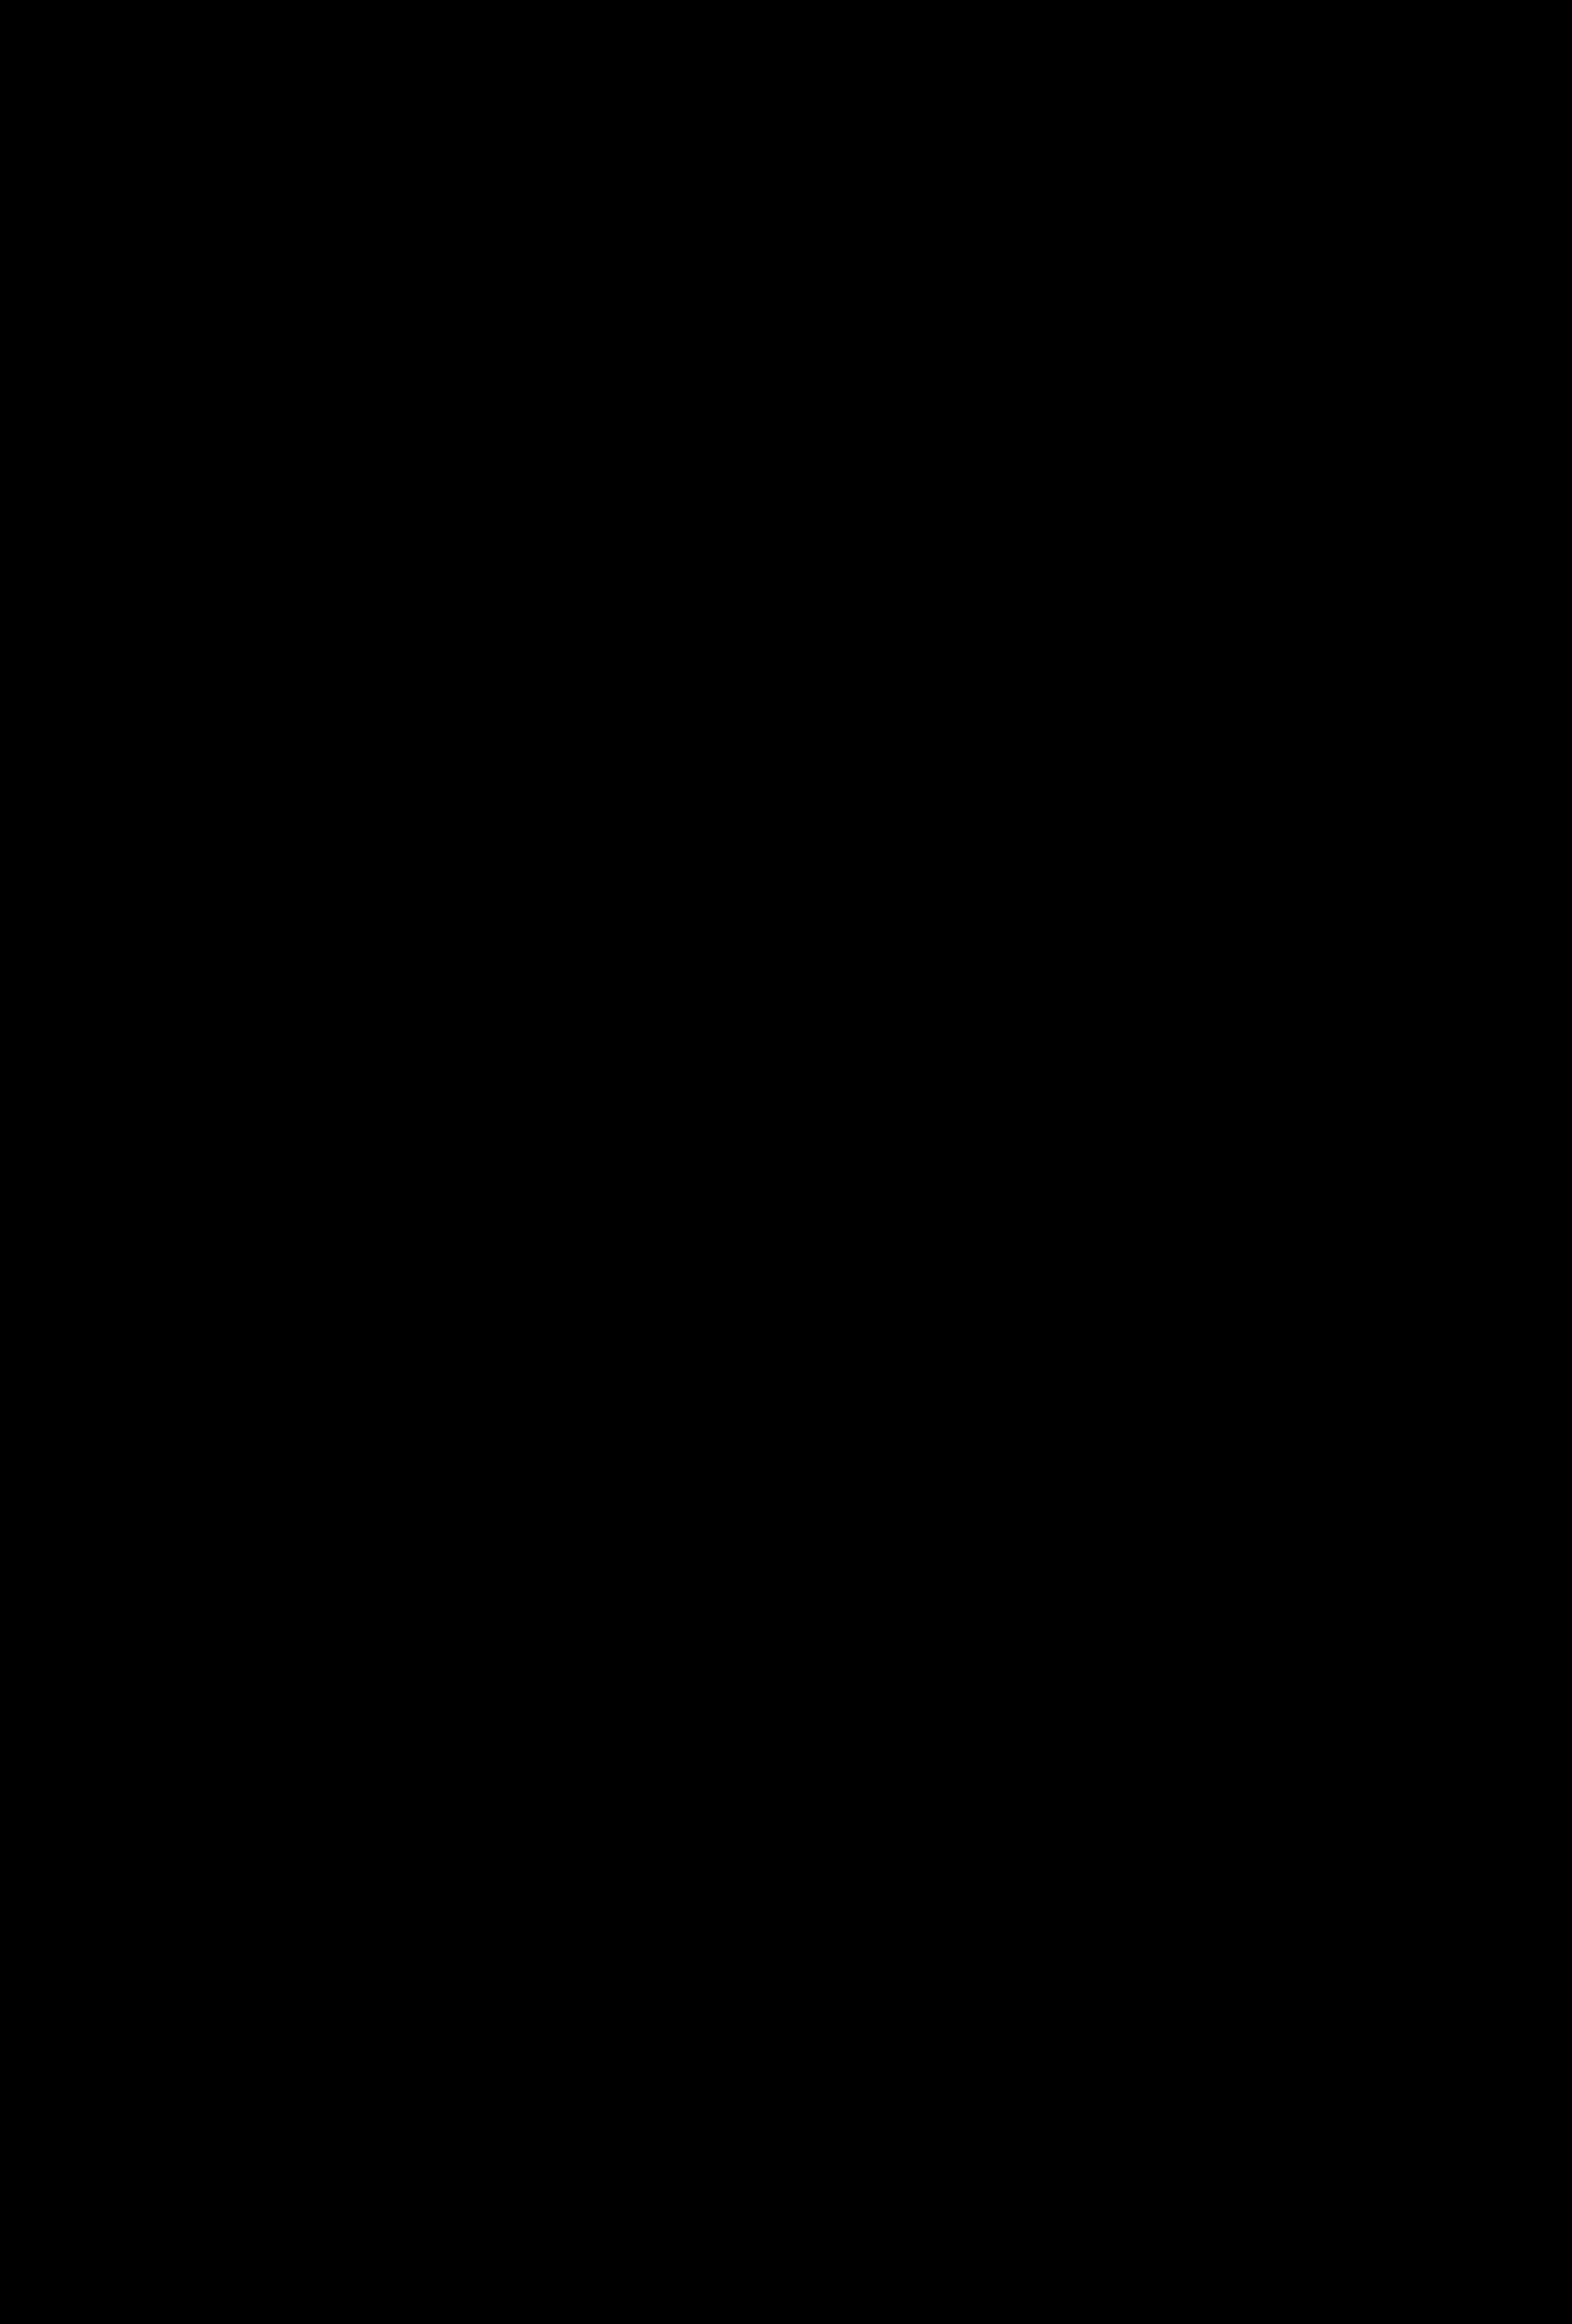 Clipart penquin silhouette. Penguin bird clip art